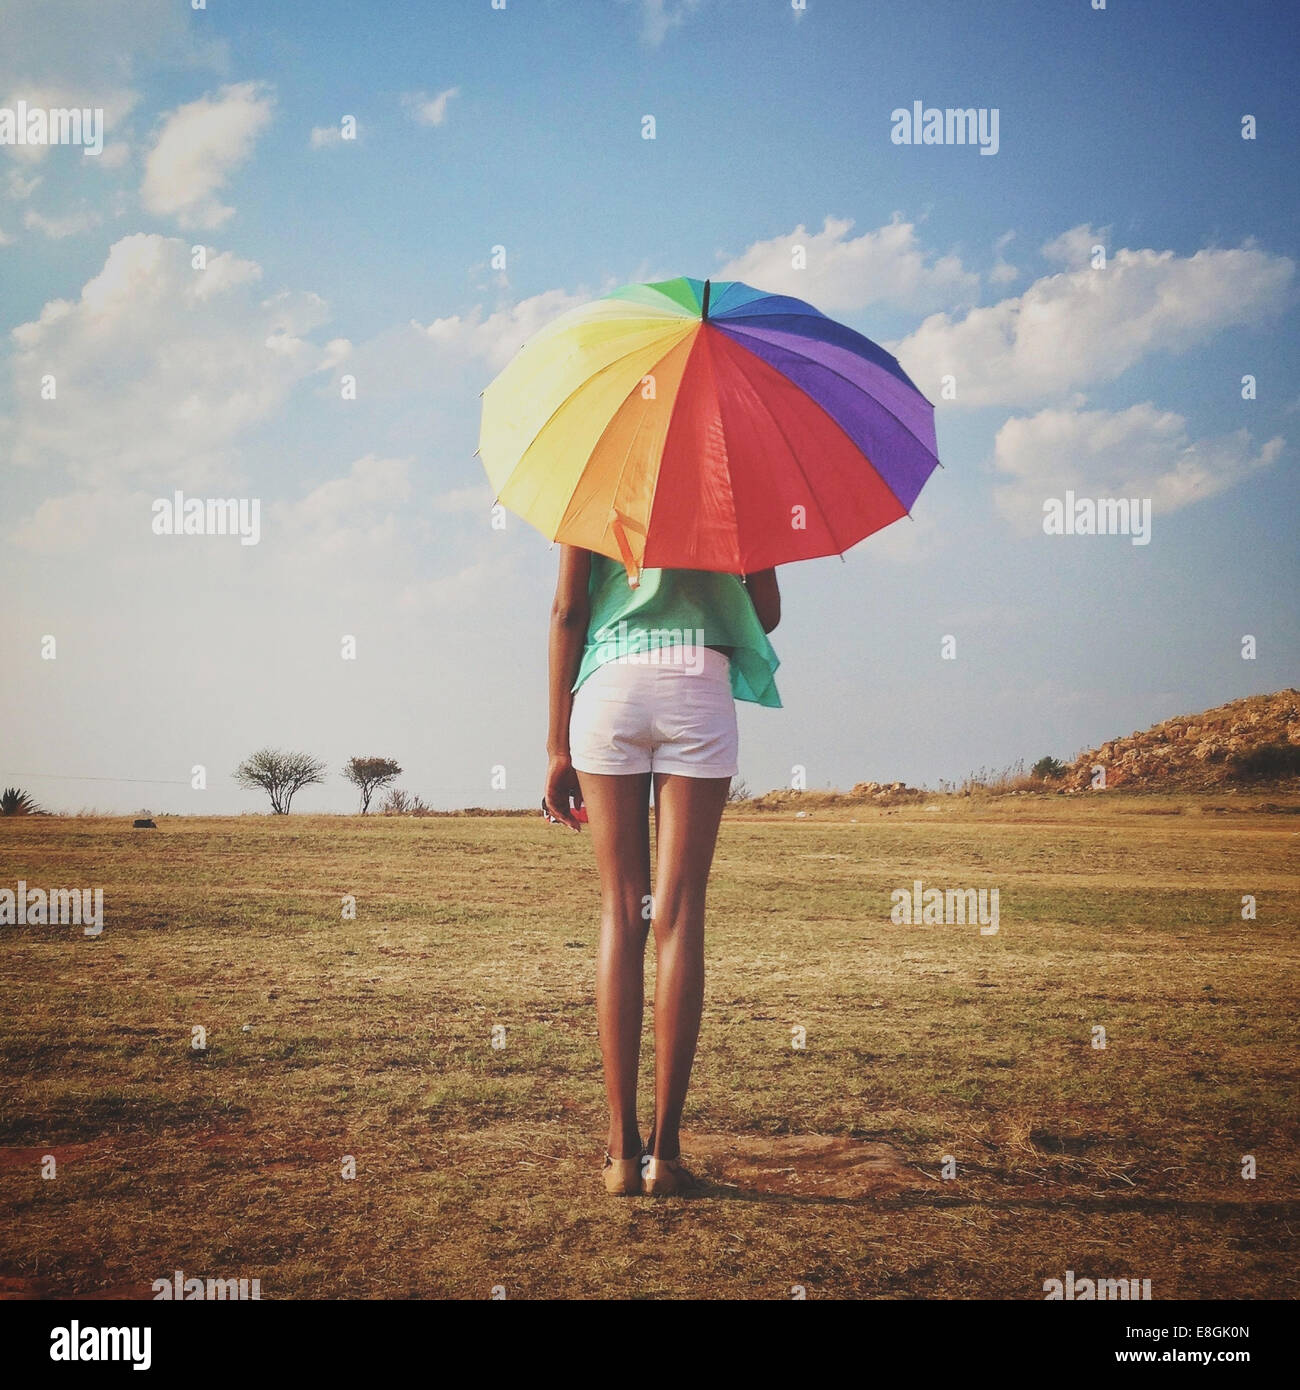 South Africa, Gauteng, Johannesburg, Roodepoort, Lady with Rainbow Umbrella - Stock Image